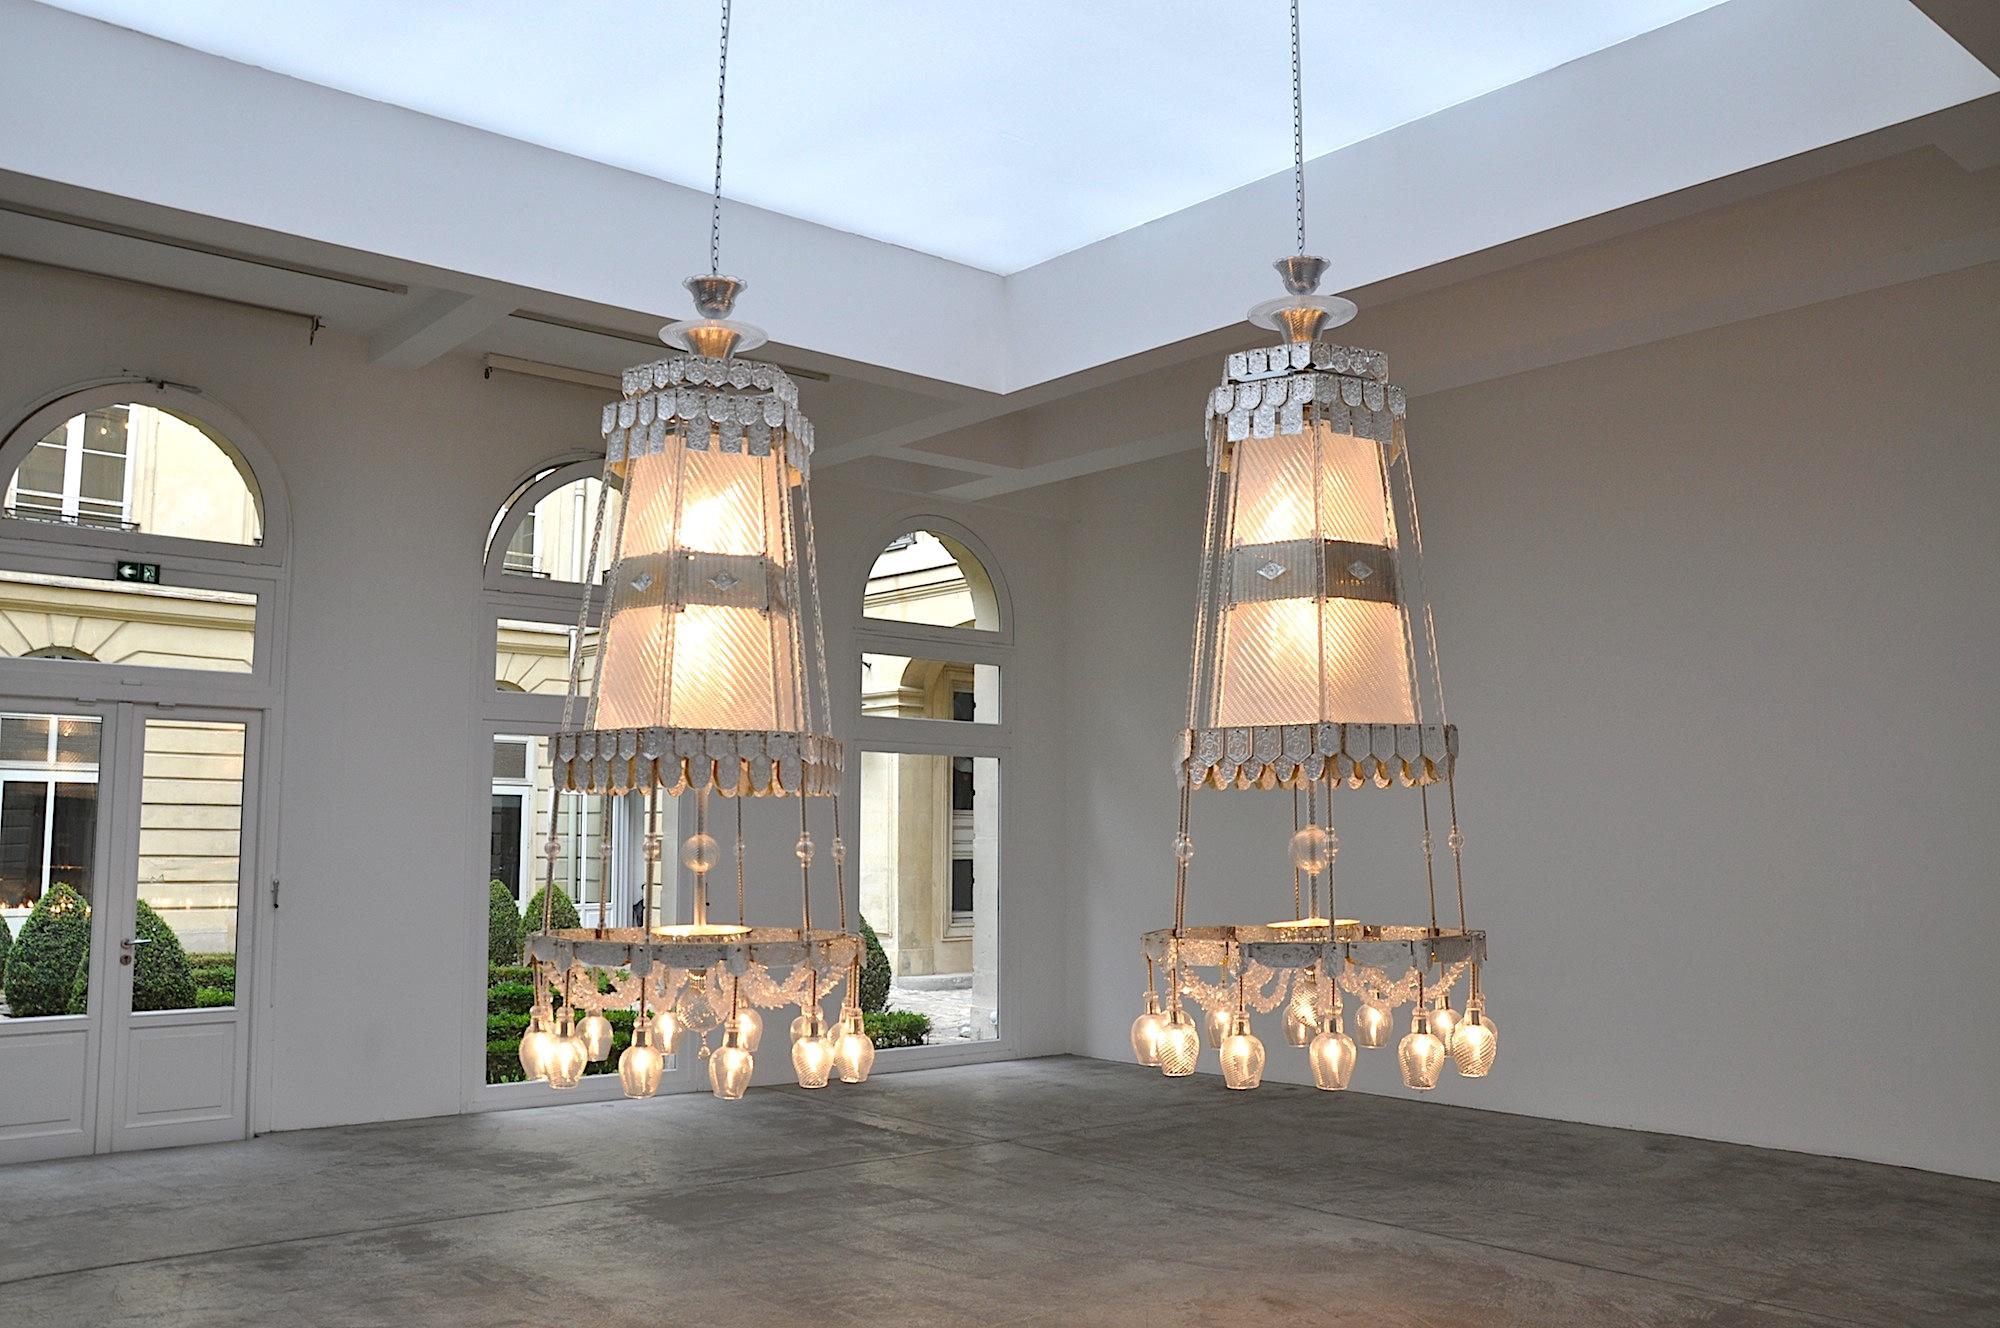 HiP Paris Blog - Ali Postma - Marian Goodman Gallery - DSC_2146LEADw